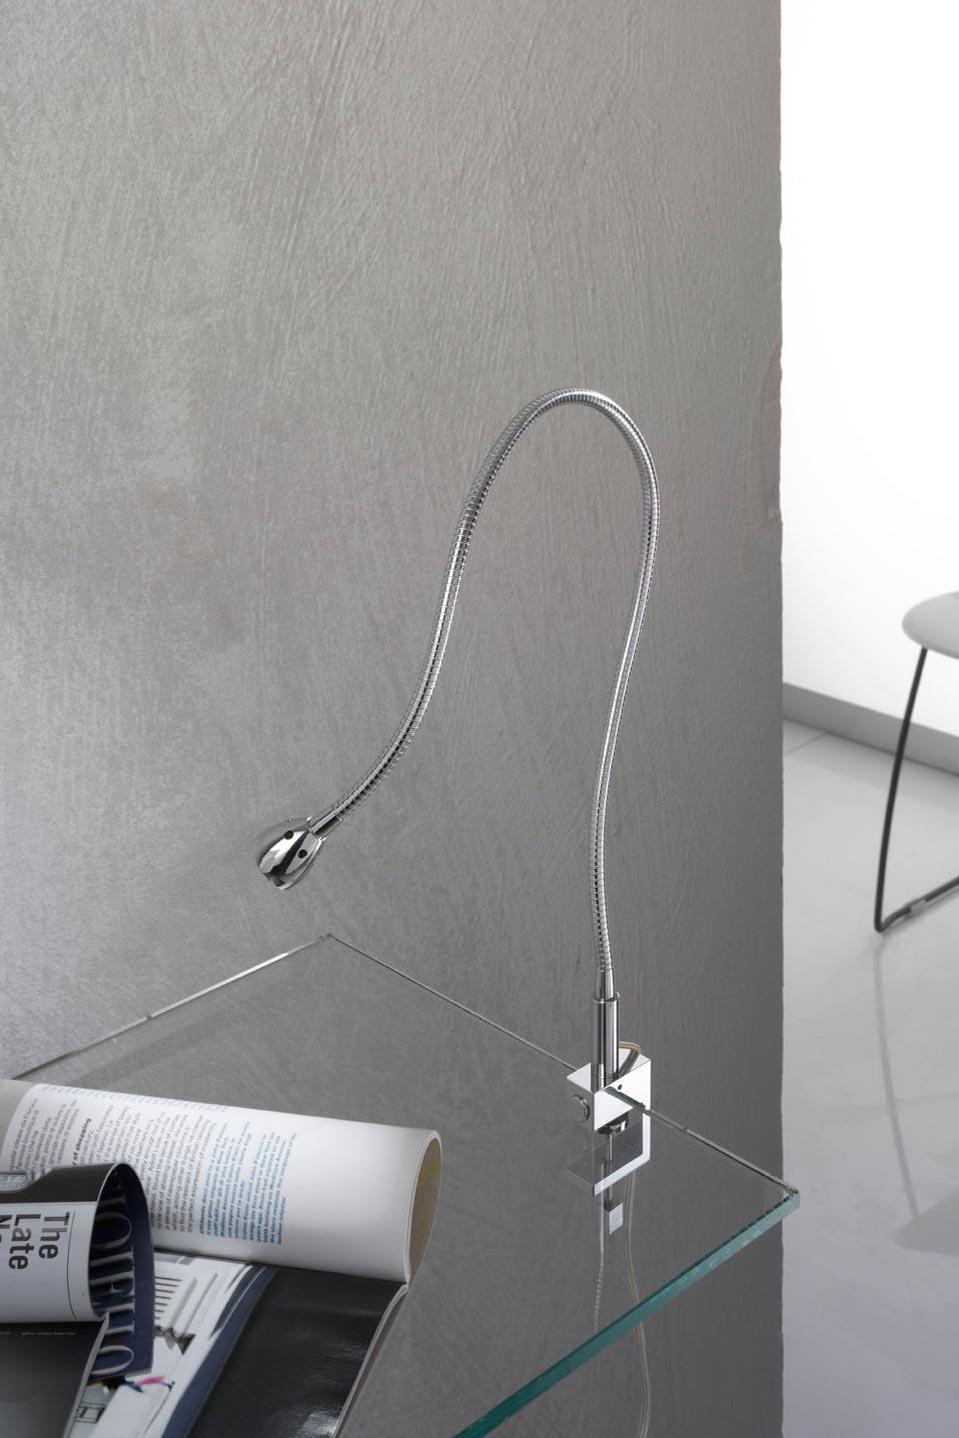 Lampe de bureau chromée sur flexible support étau. Oma Illuminazione.